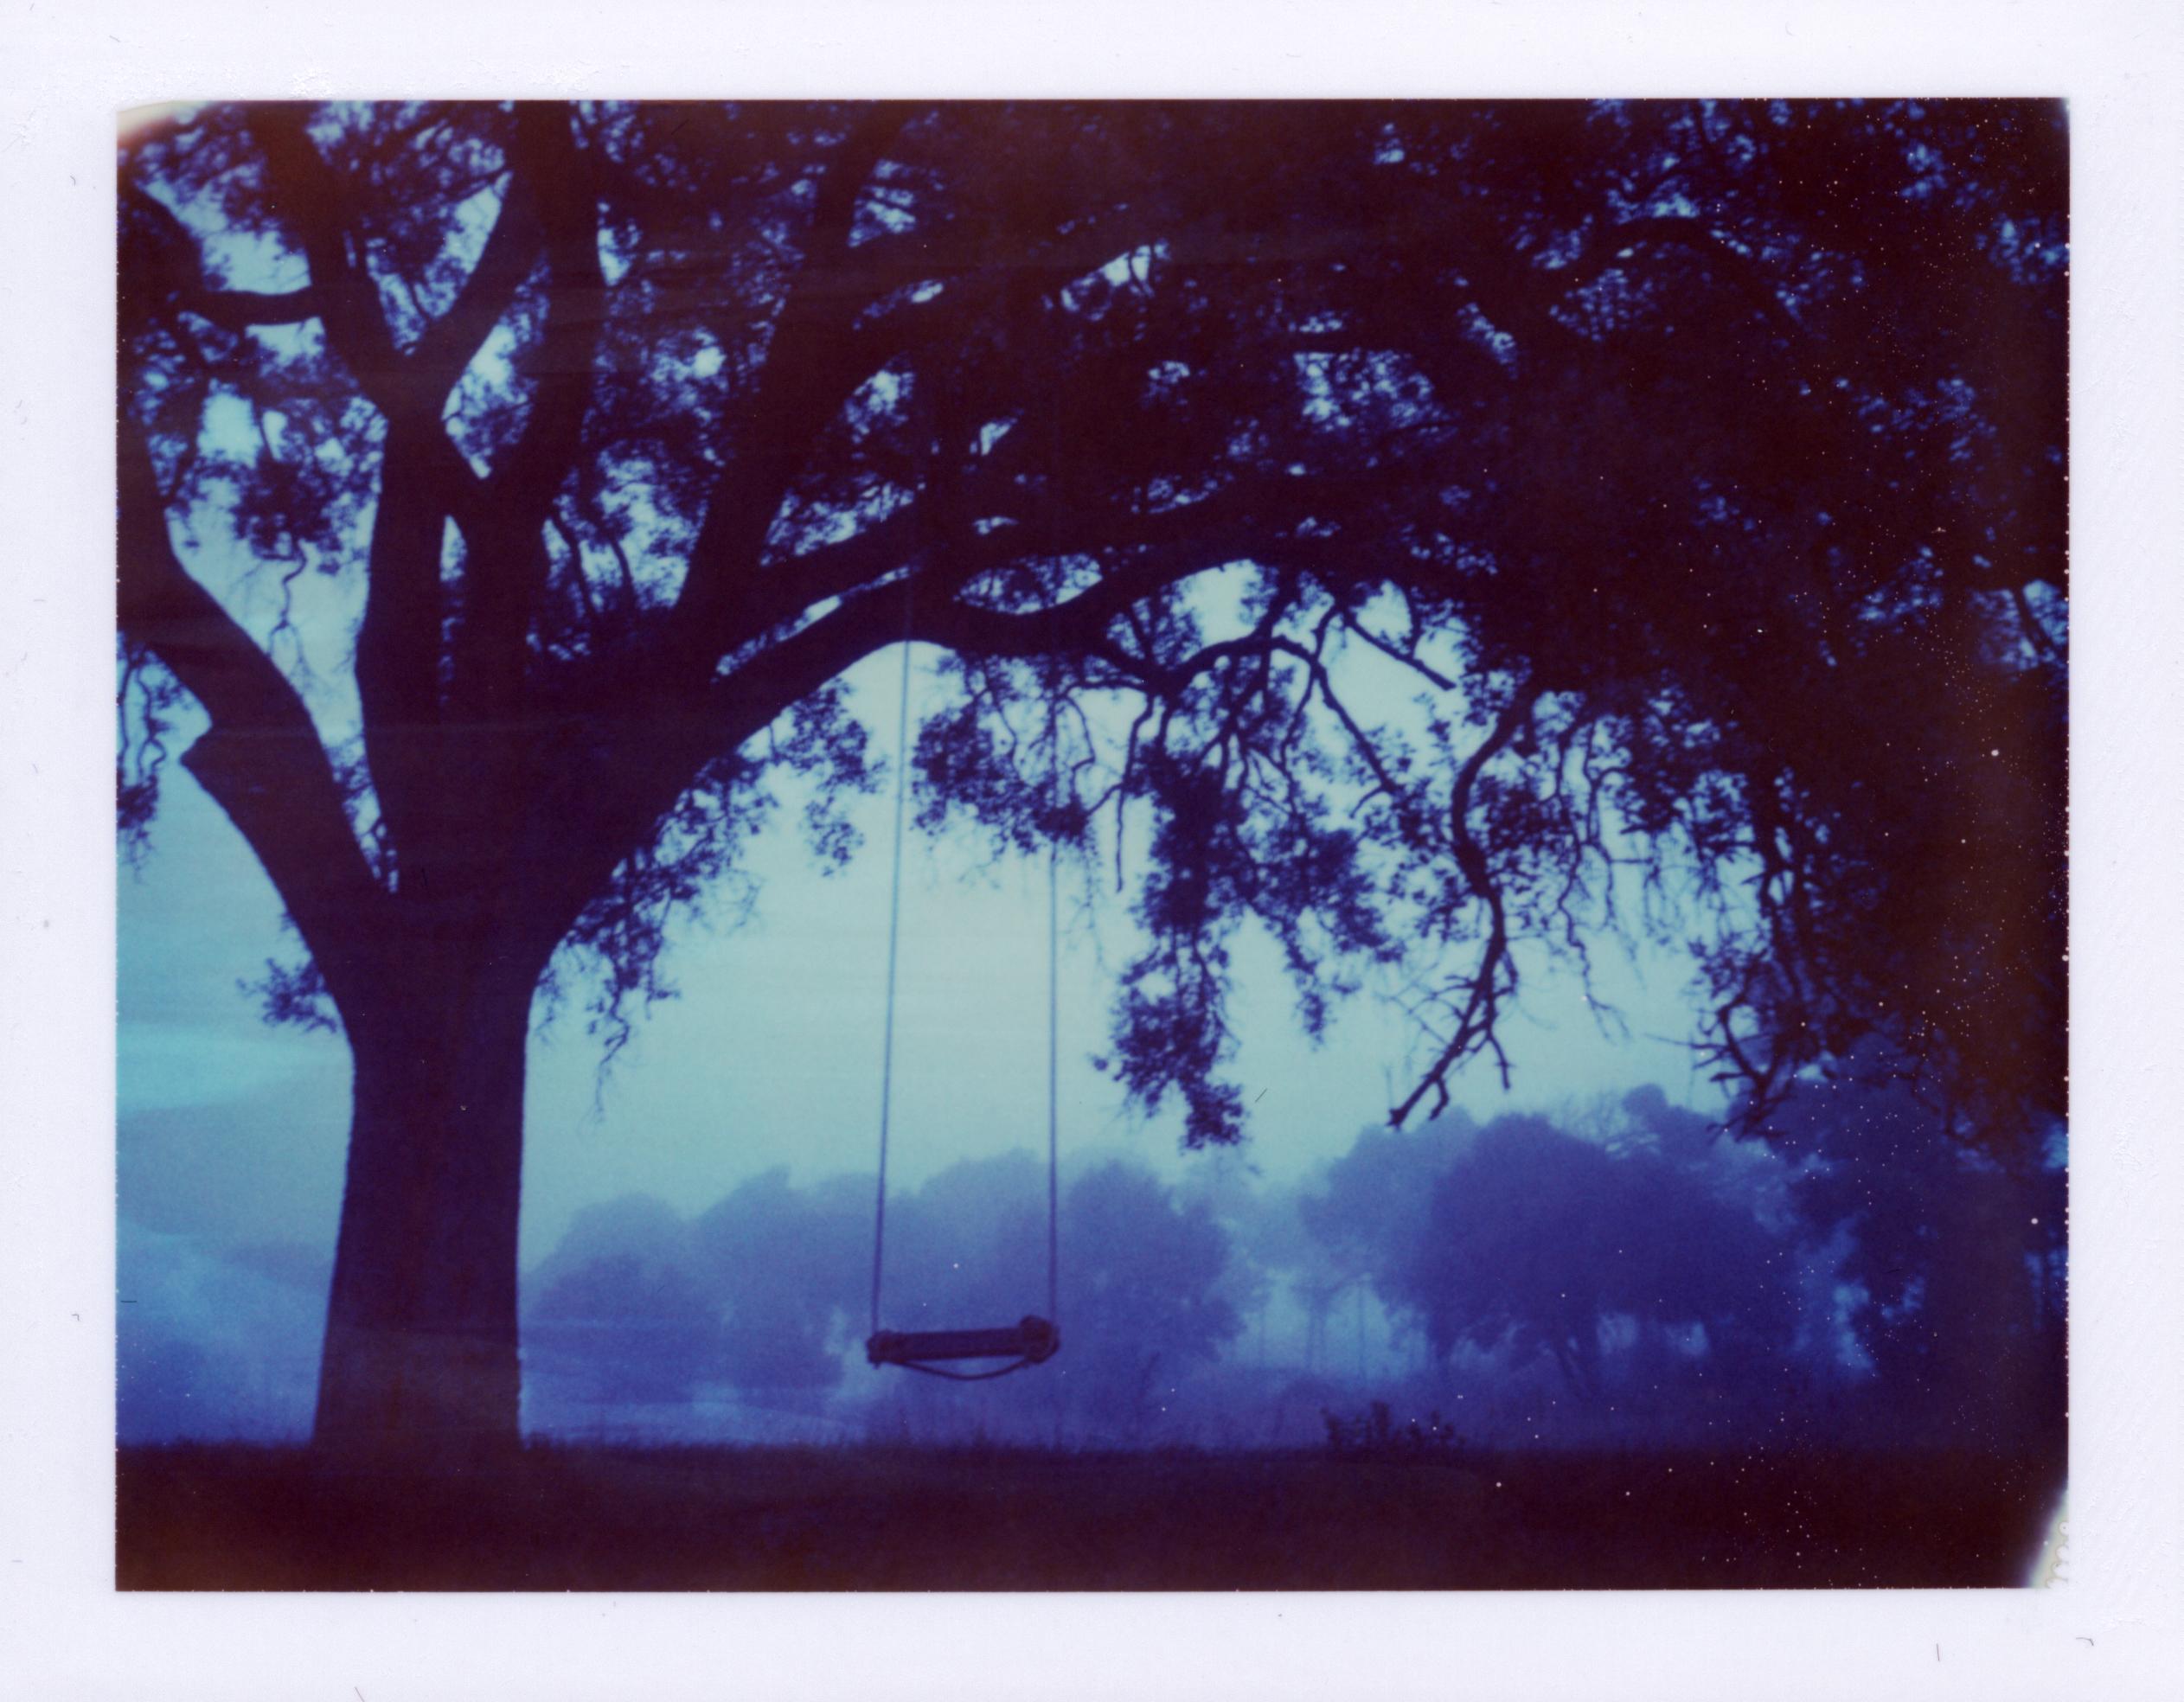 Hintergrundbilder : Bäume, Malerei, Himmel, Kunstwerk, lila, Ast ...